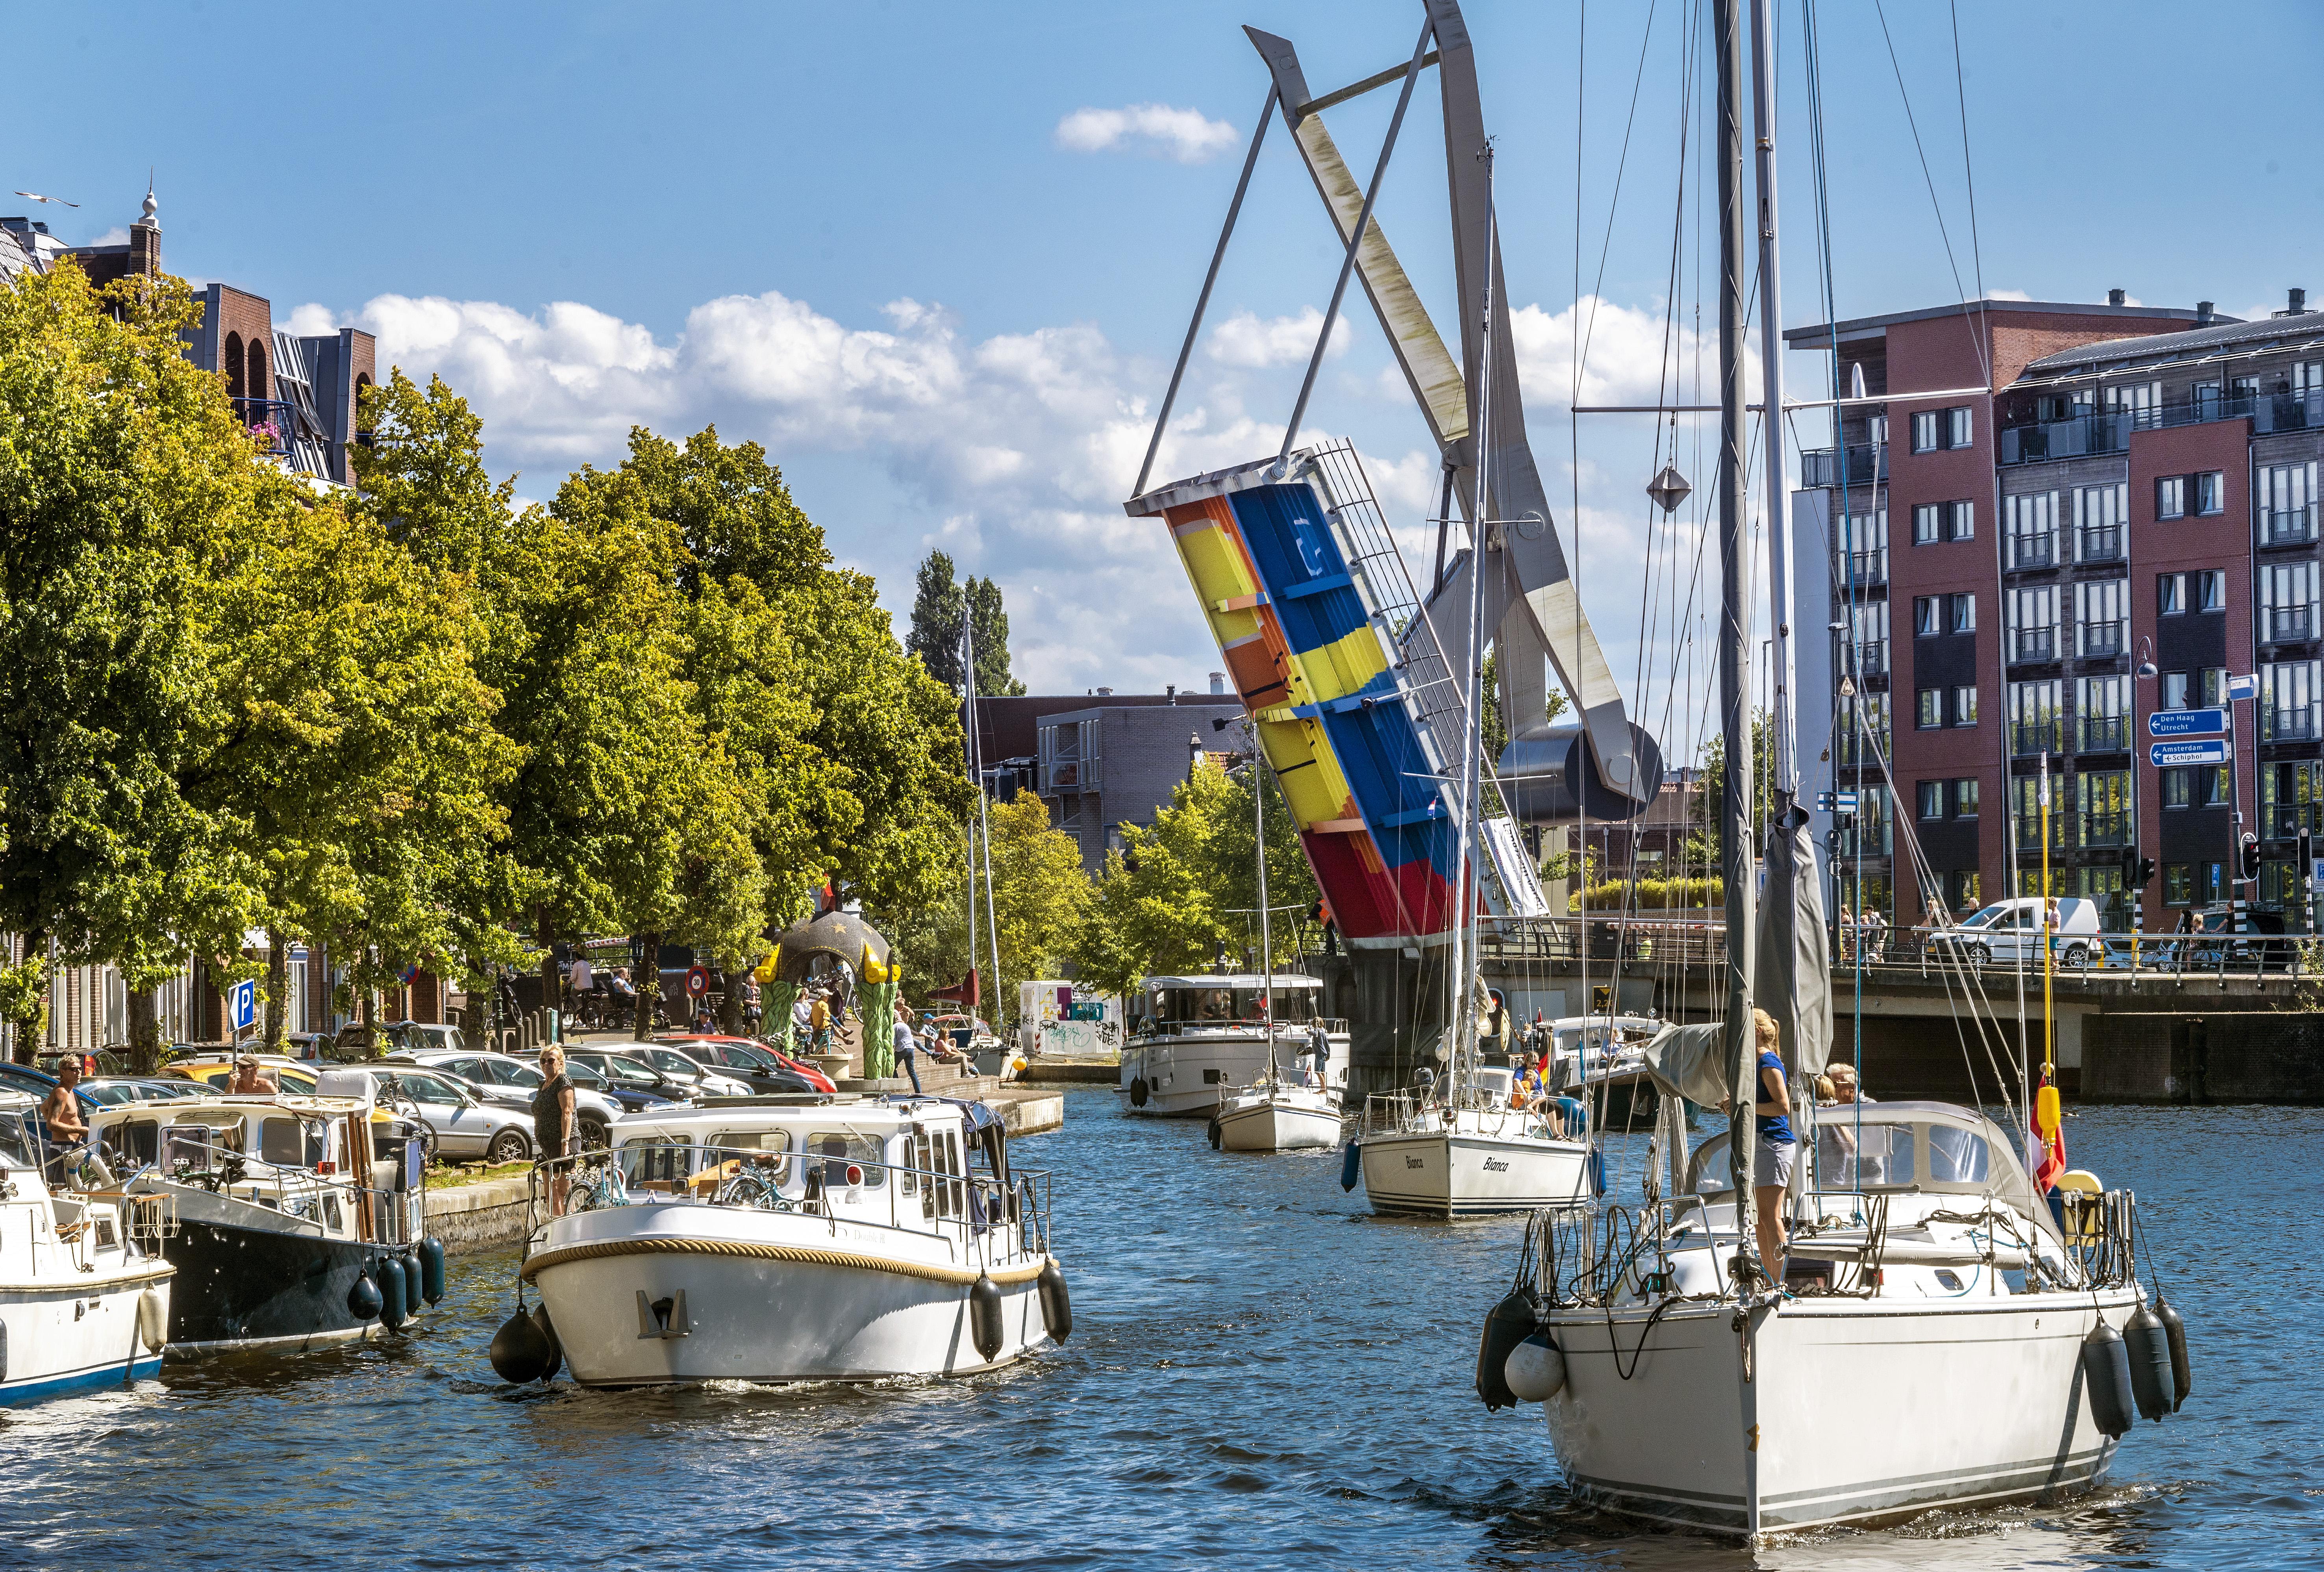 Hitte: de ene na andere brug in problemen in Haarlem